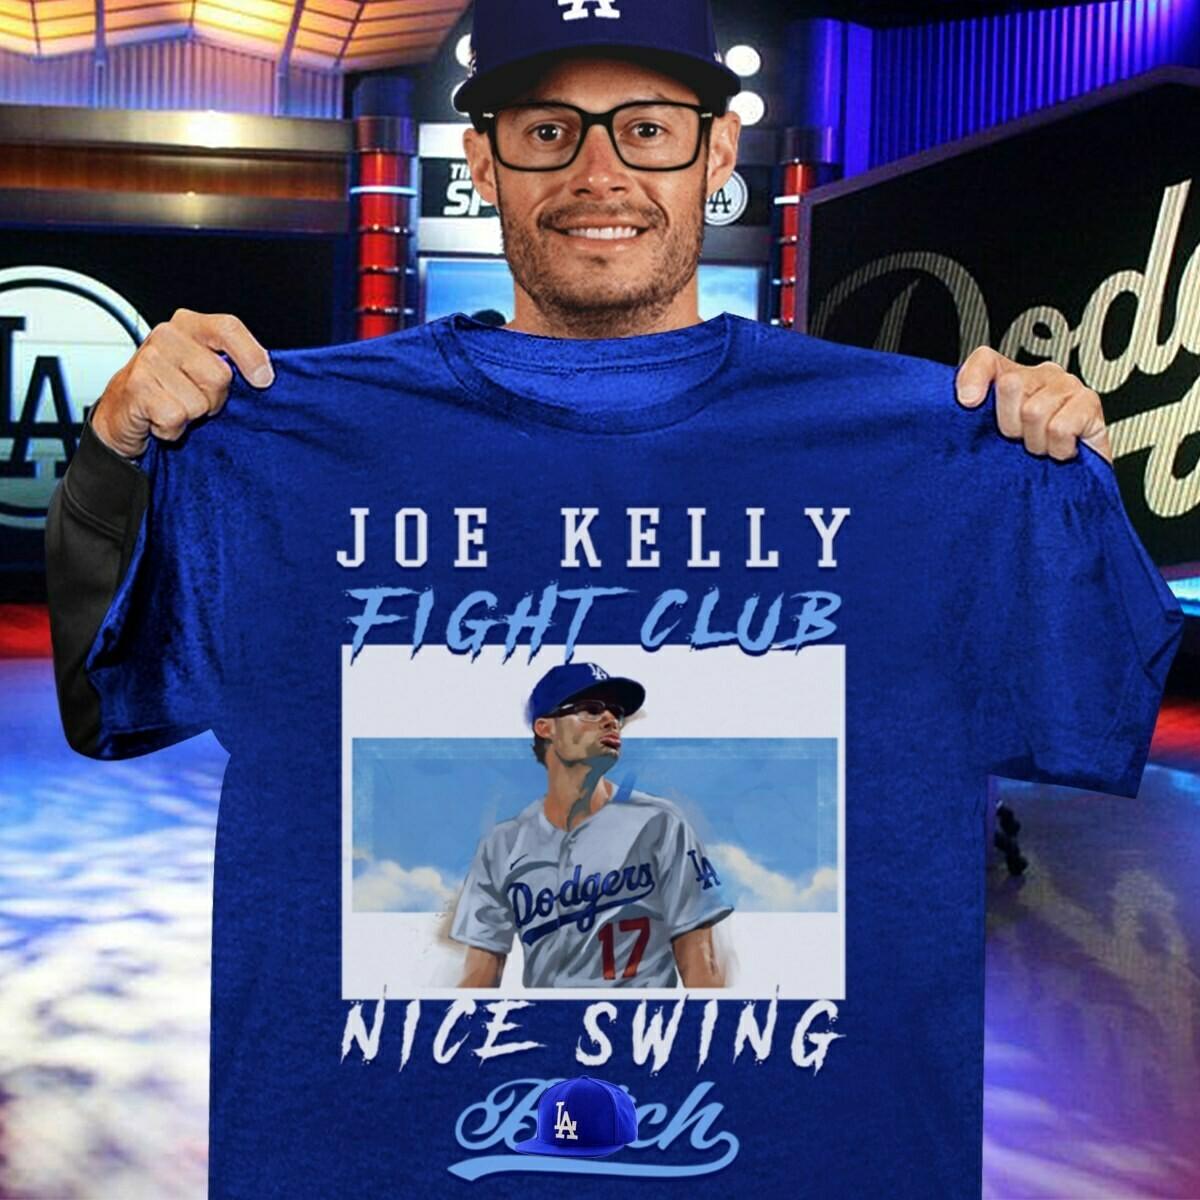 Joe Kelly Fight Club Nice Swing shirt